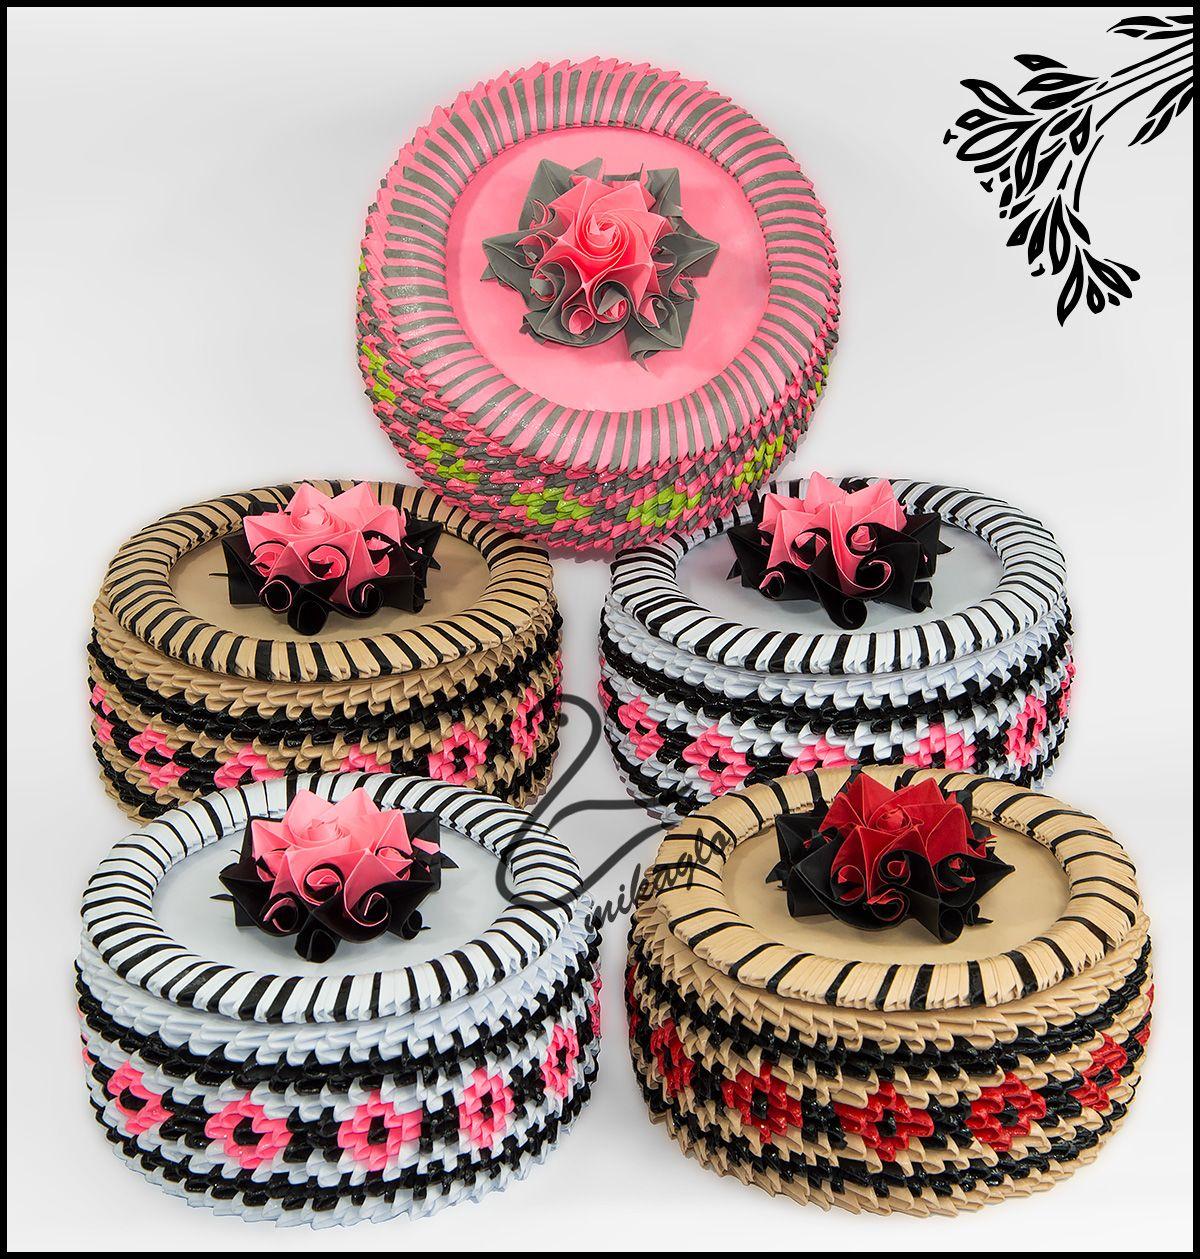 Flower boxes tutorial -> mikaglo.blogspot.com | 3d origami ... - photo#44